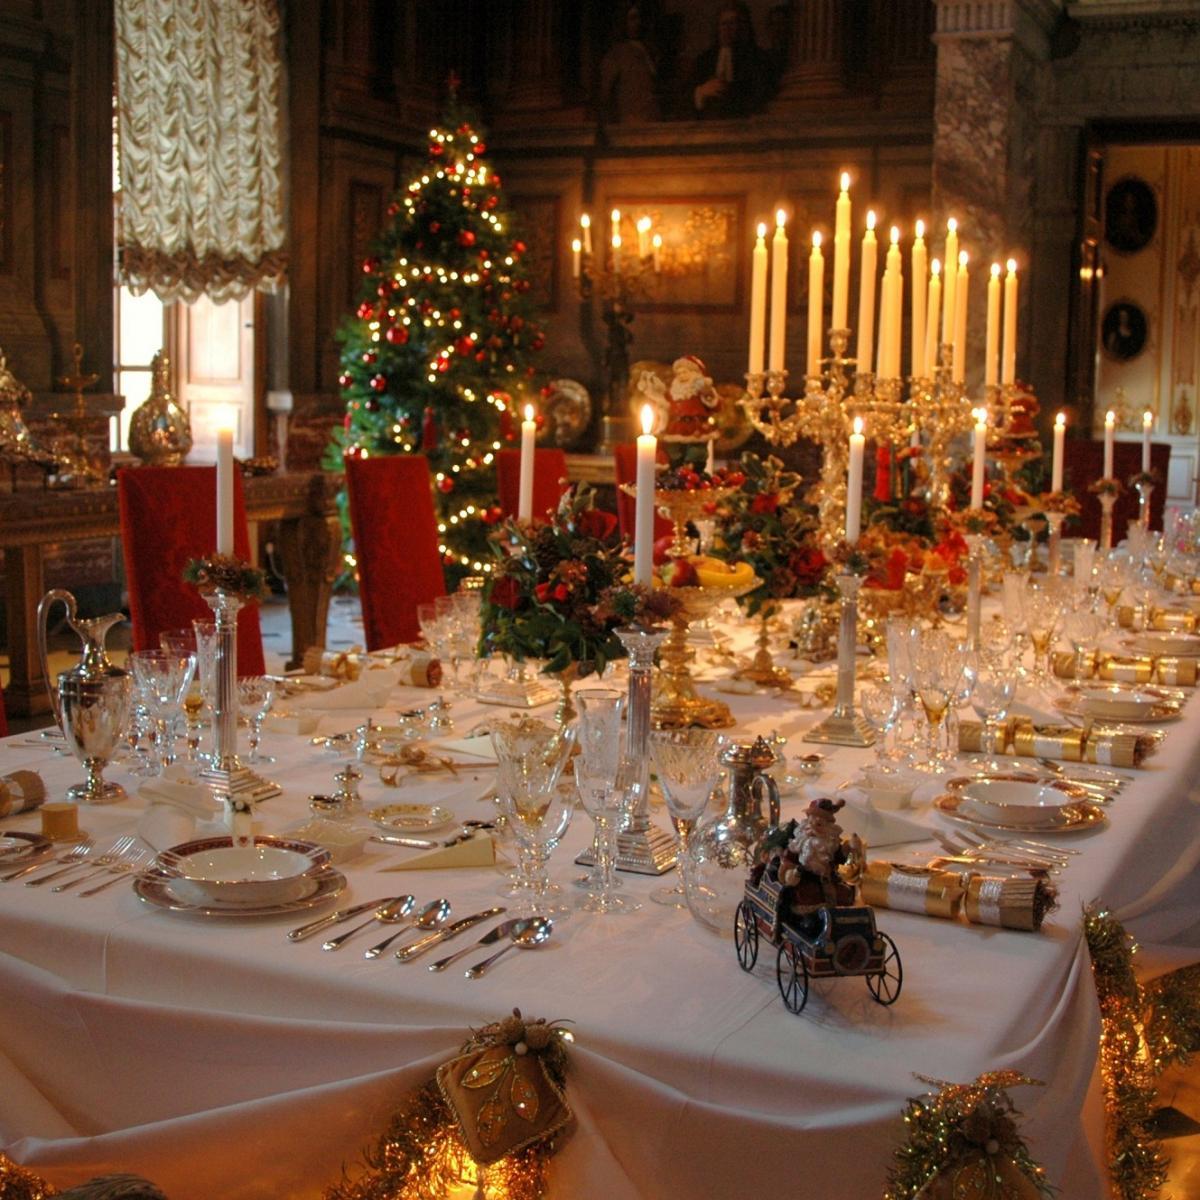 A Traditional Blenheim Christmas - Table dressed for Christmas